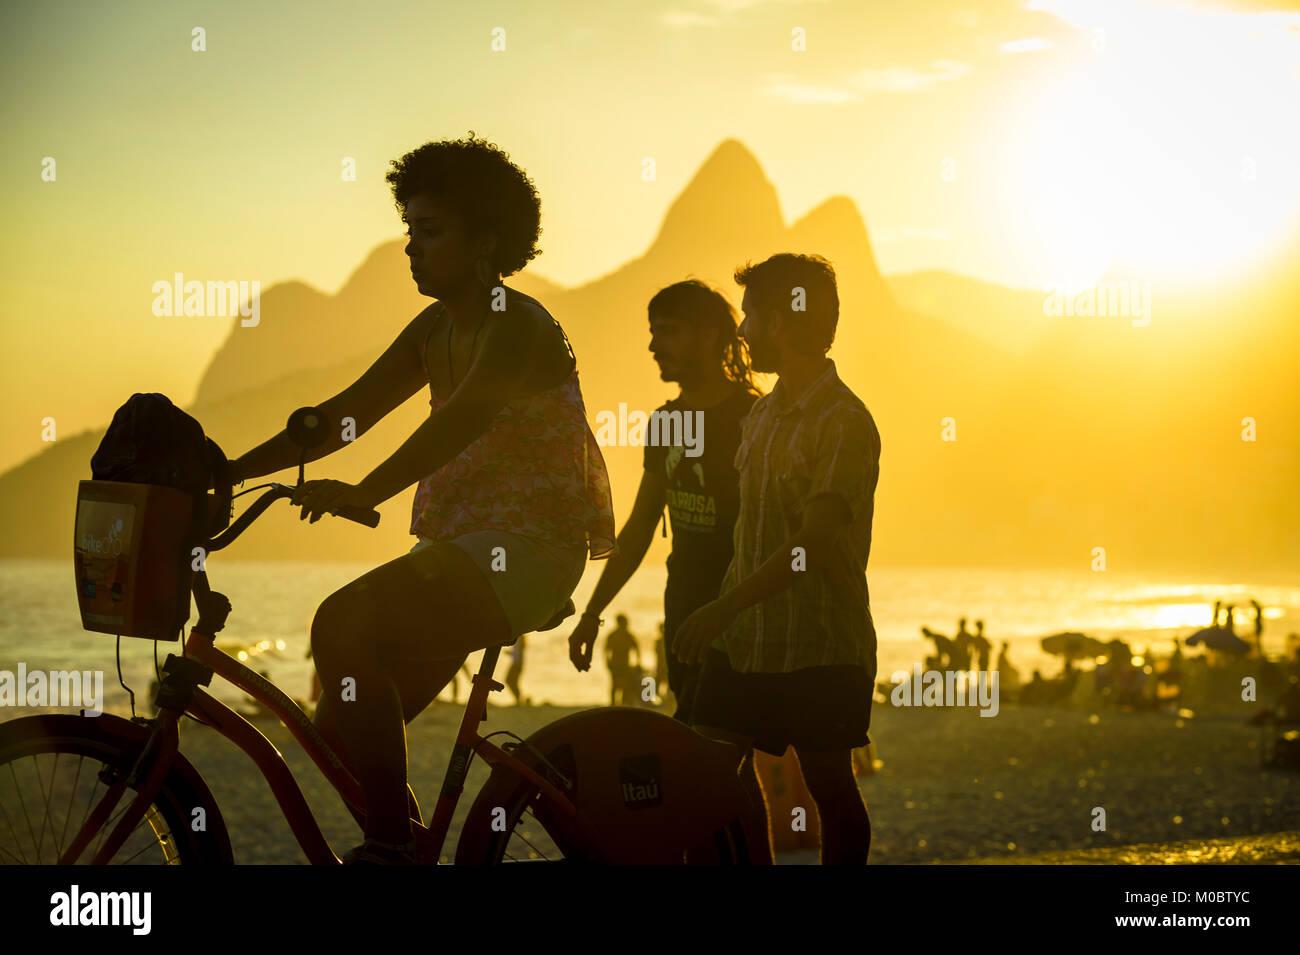 RIO DE JANEIRO - MARCH 20, 2017: Visitors pass along Ipanema Beach to Arpoador, a popular spot to take in the sunset - Stock Image